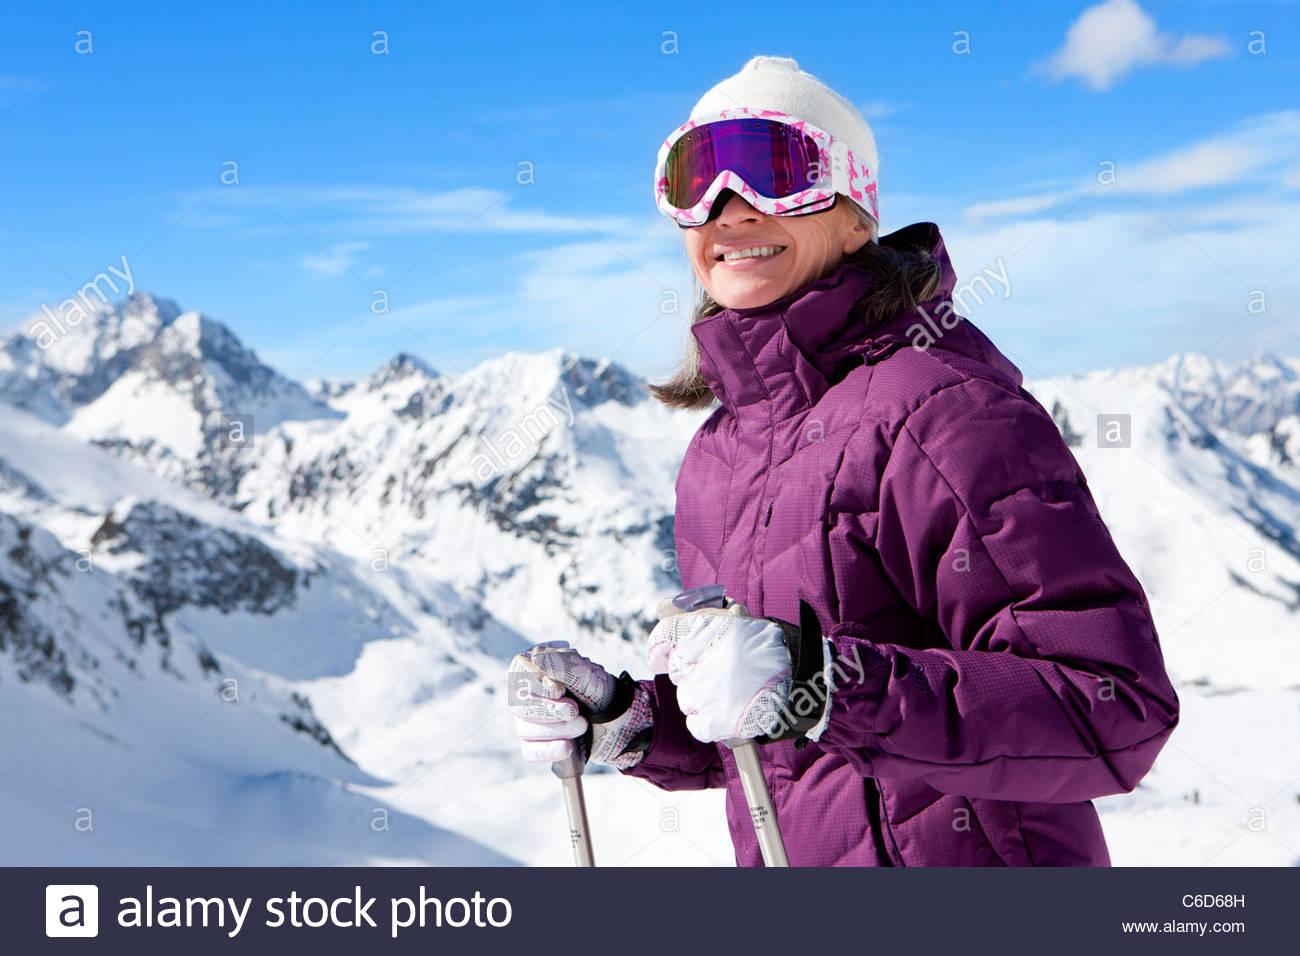 Smiling woman wearing ski goggles and holding ski poles on snowy mountain - Stock Image